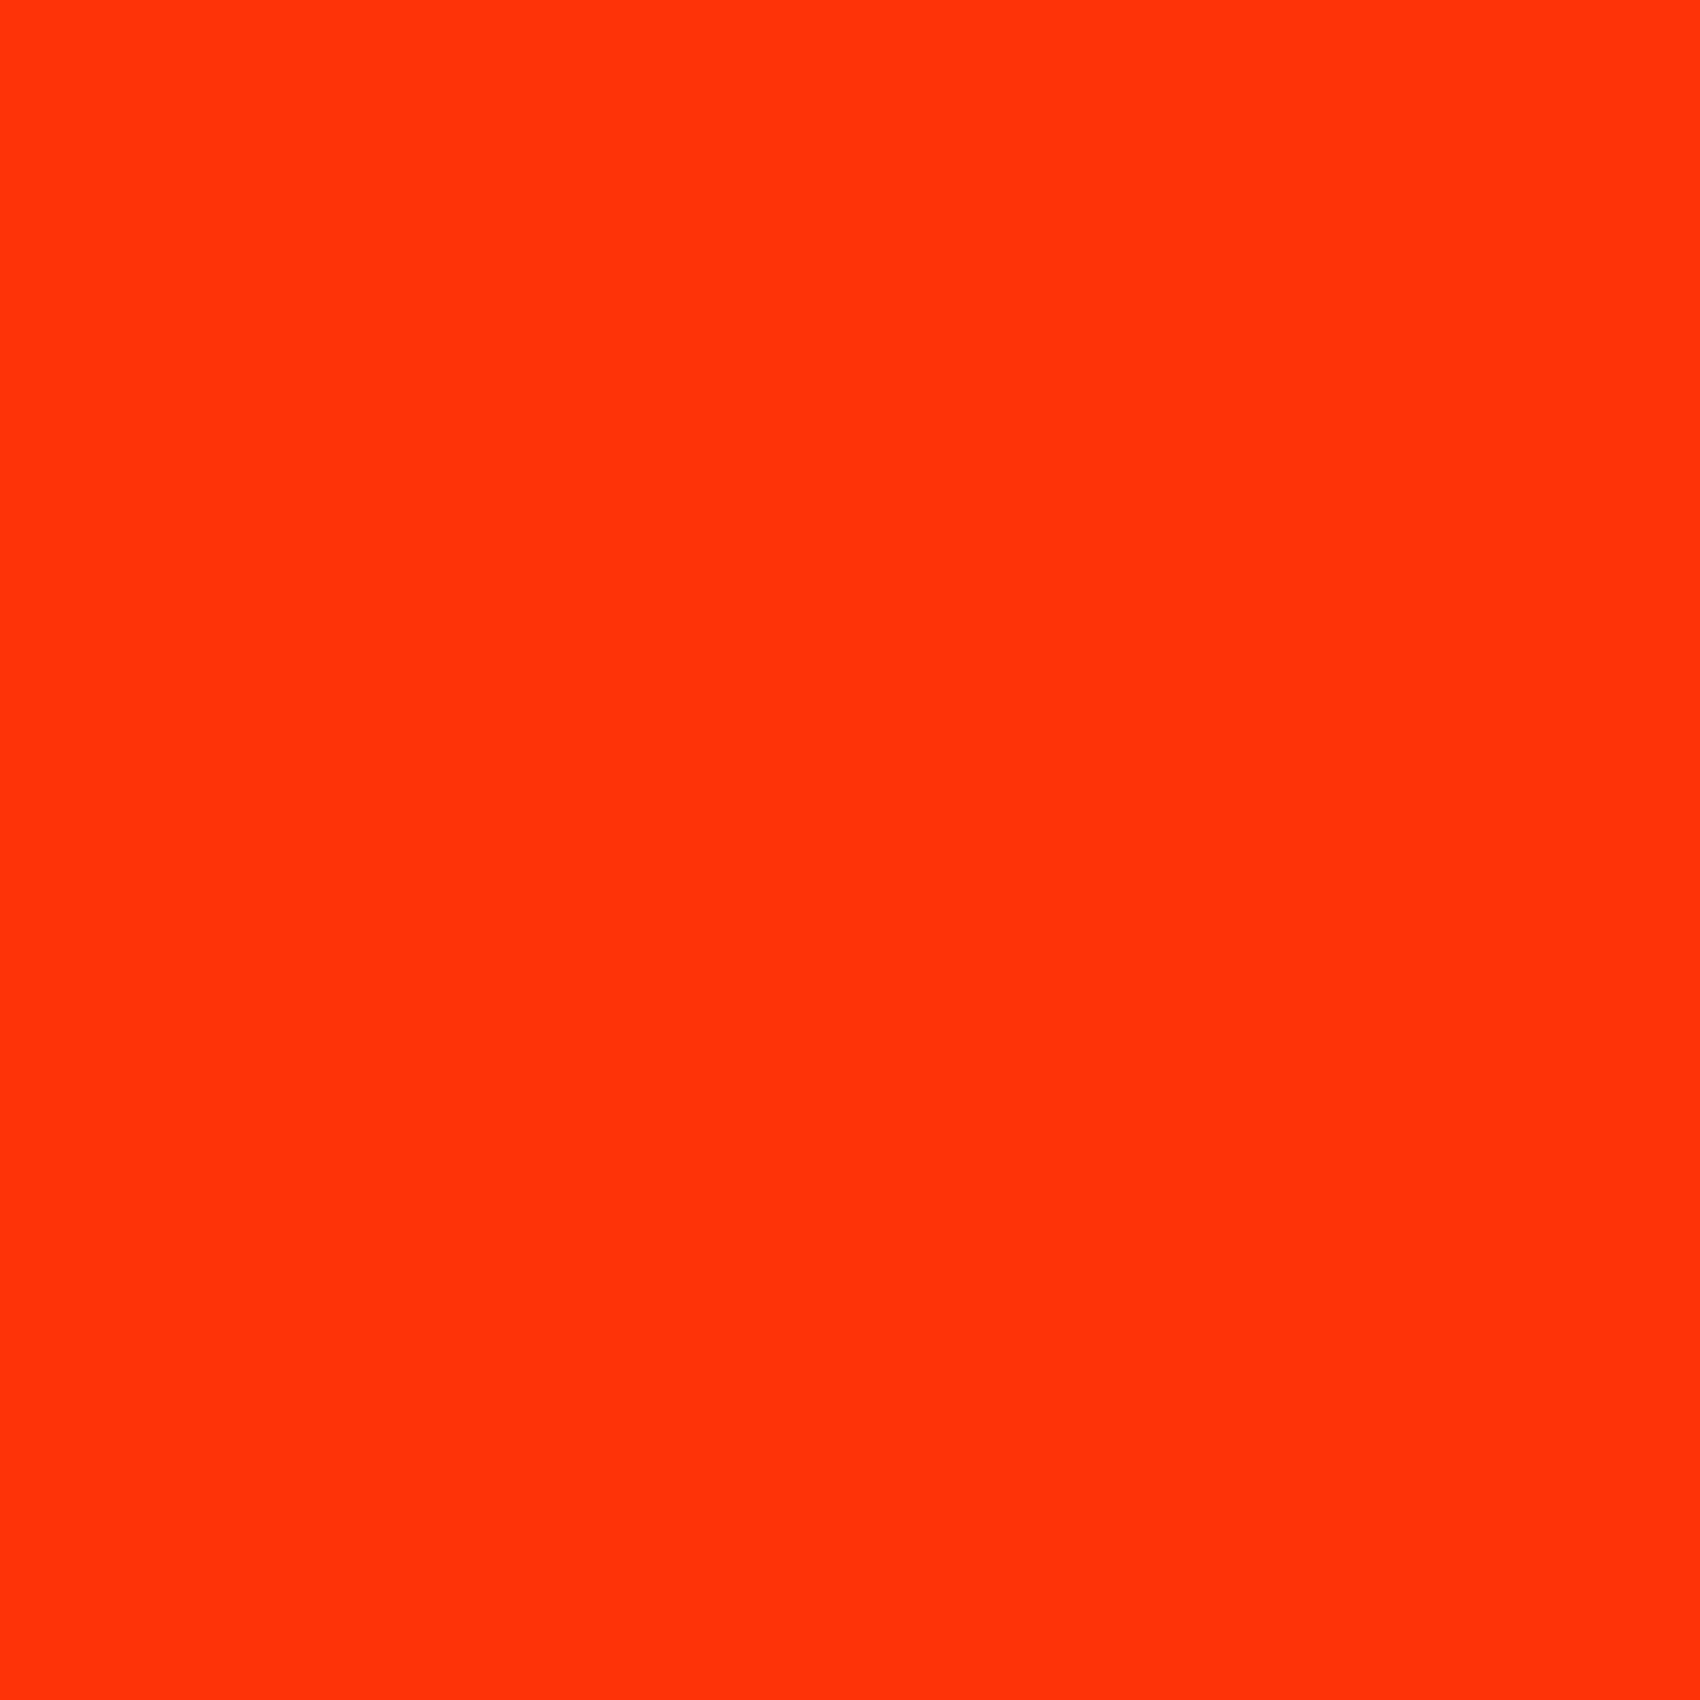 50m x6cm Neon Folie Oracal 6510 Plotterfolie Bastelfolie Klebefolie Folienreste